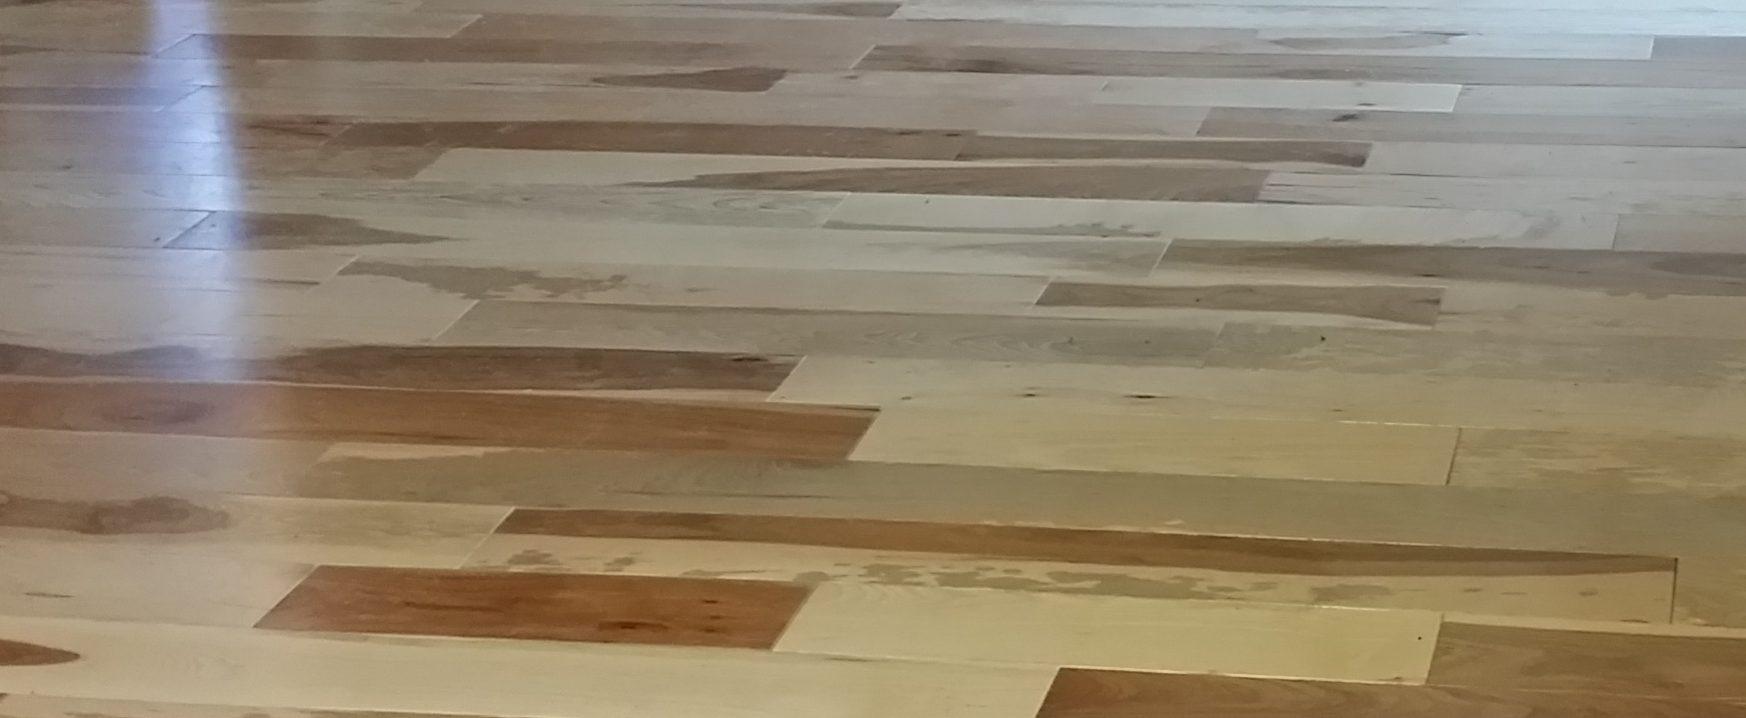 Hardwood and Tile Flooring